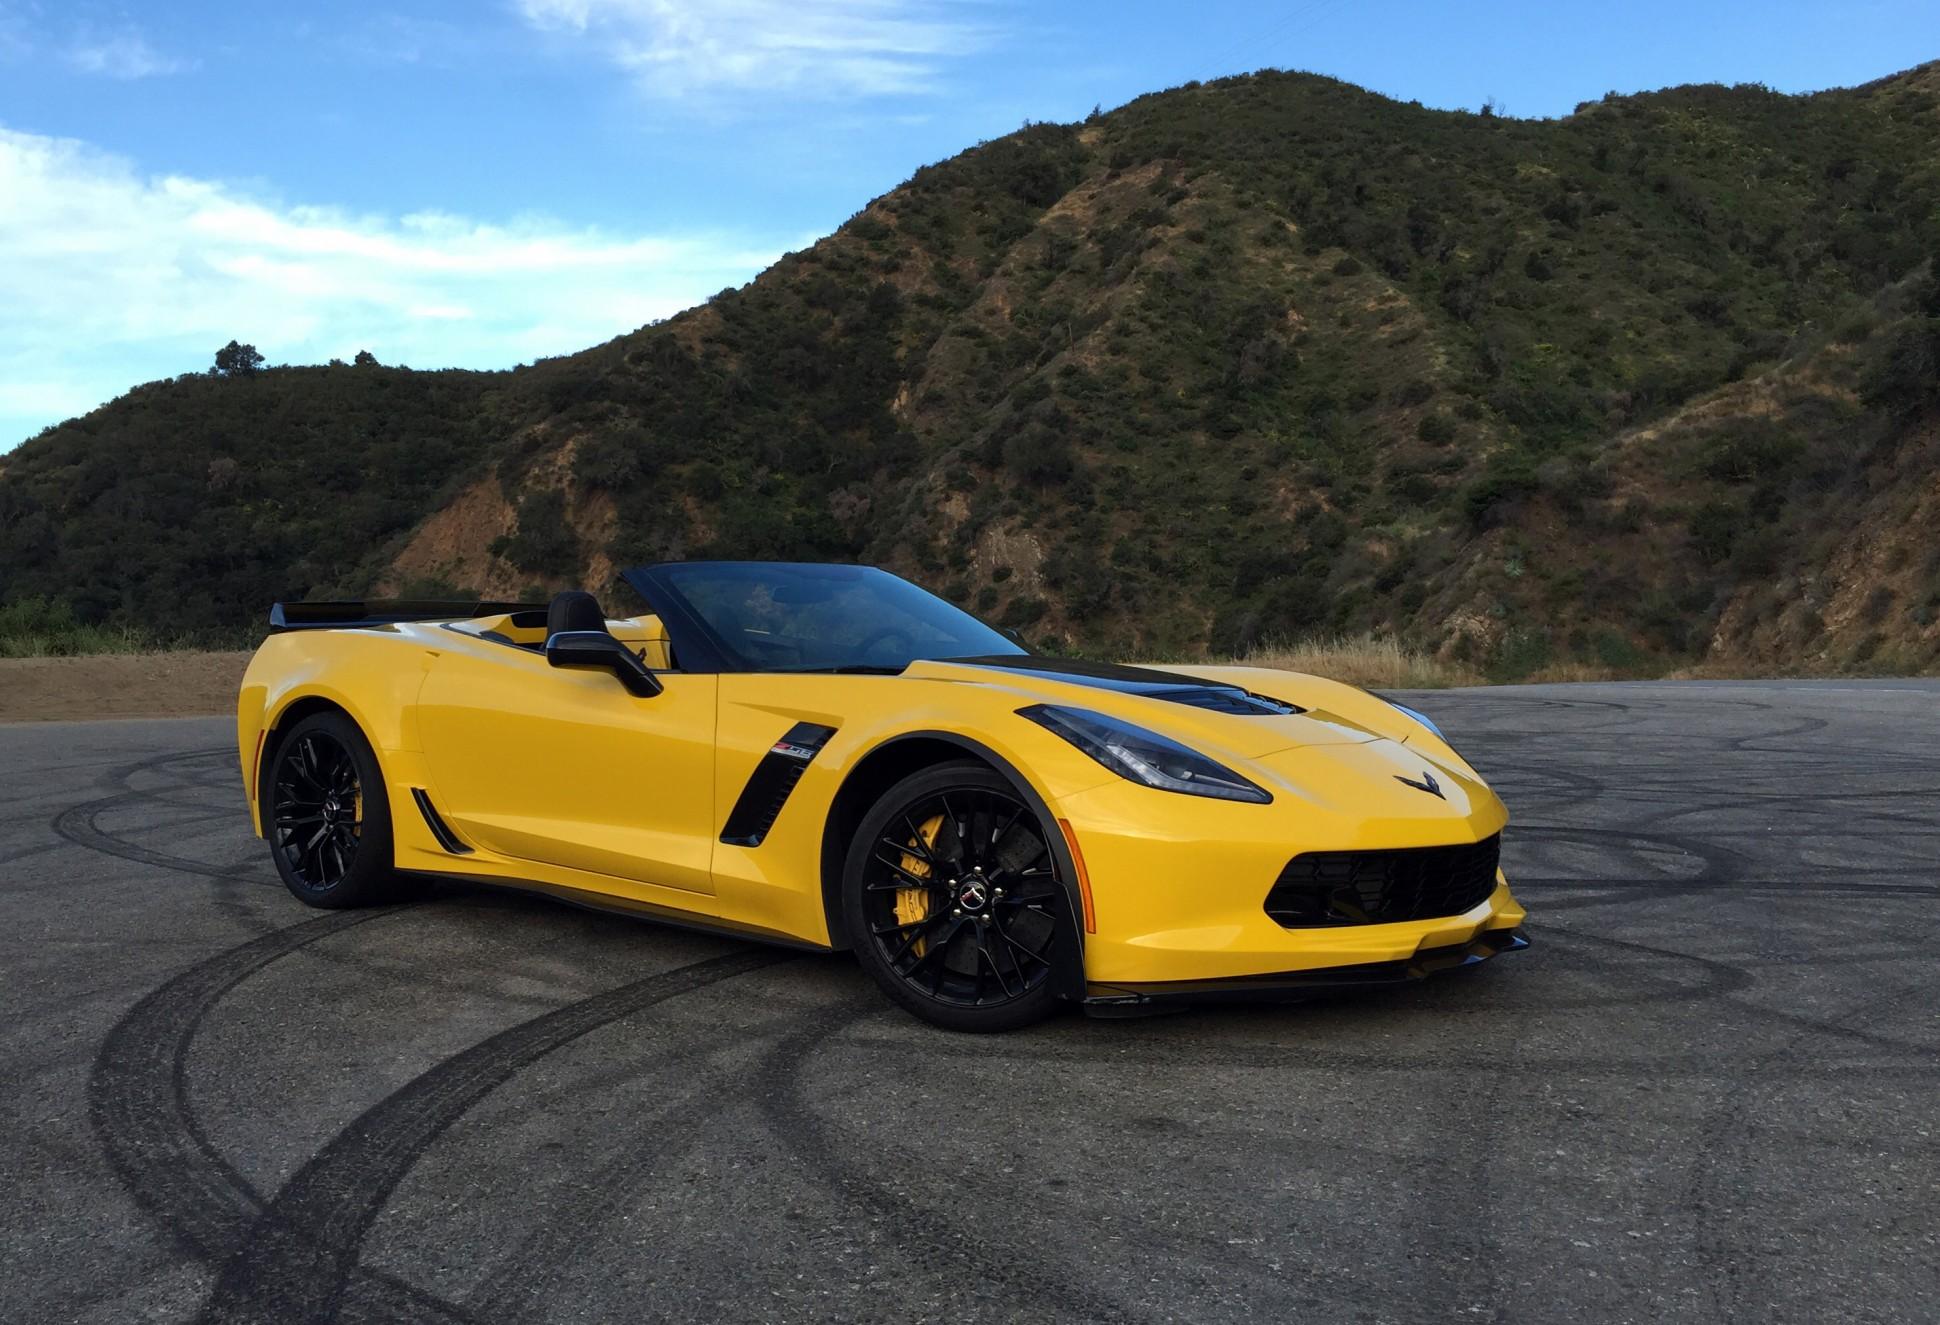 car ancestrysports car agility muscle car heart the 2015 corvette z06 convertible car ancestry. Black Bedroom Furniture Sets. Home Design Ideas